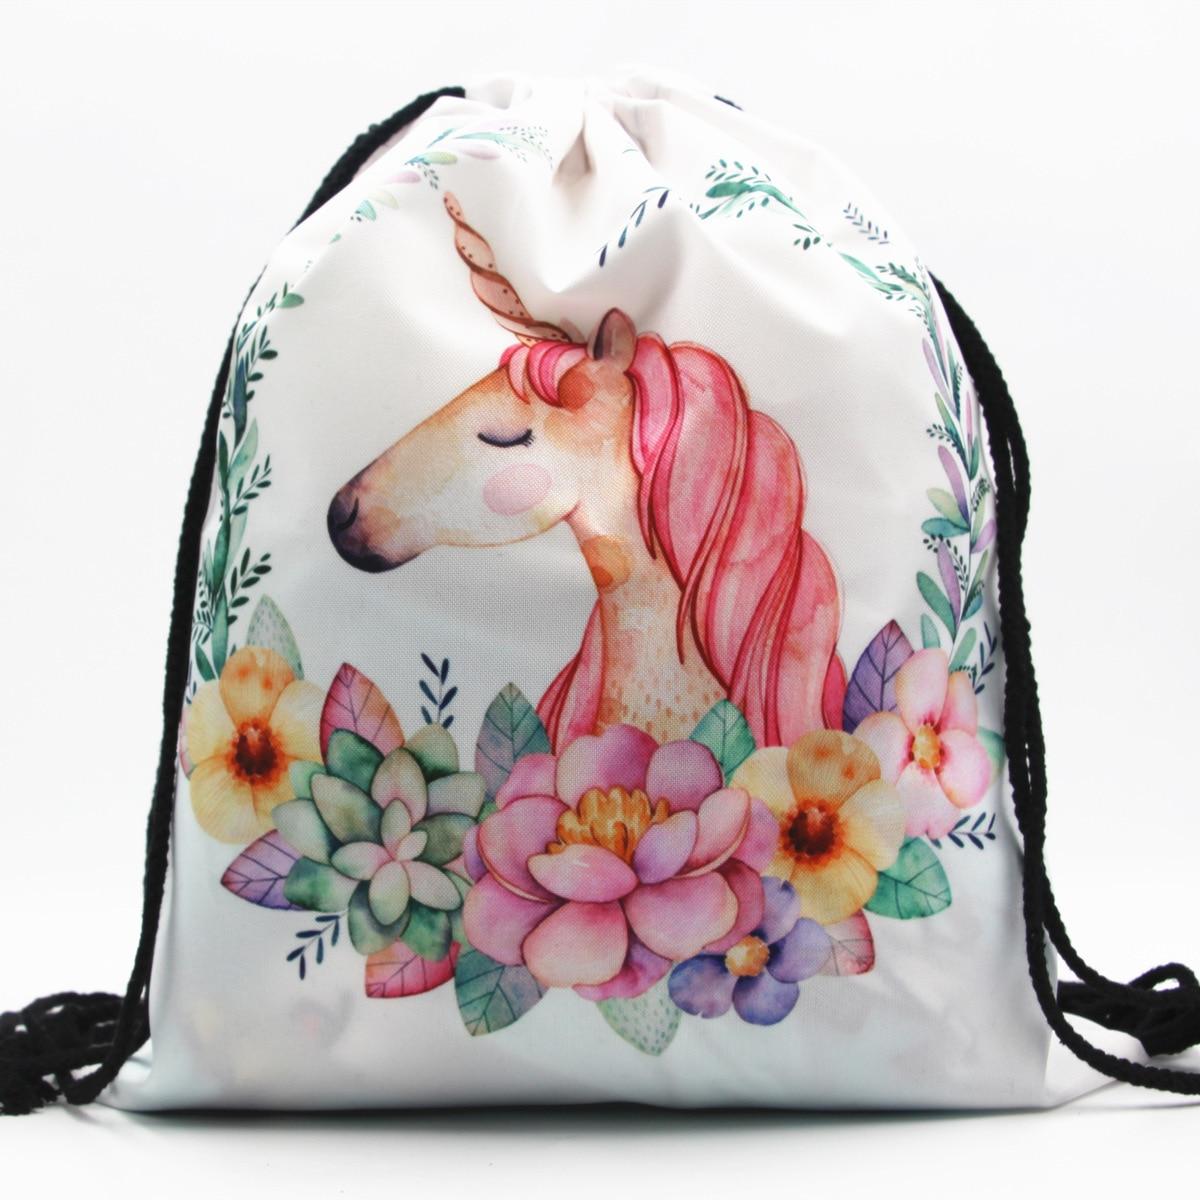 2018 New Fashion Women Unicorn Backpack 3D Printing Travel Softback Women  Drawstring Bag School Girls Backpacks2018 New Fashion Women Unicorn Backpack 3D Printing Travel Softback Women  Drawstring Bag School Girls Backpacks